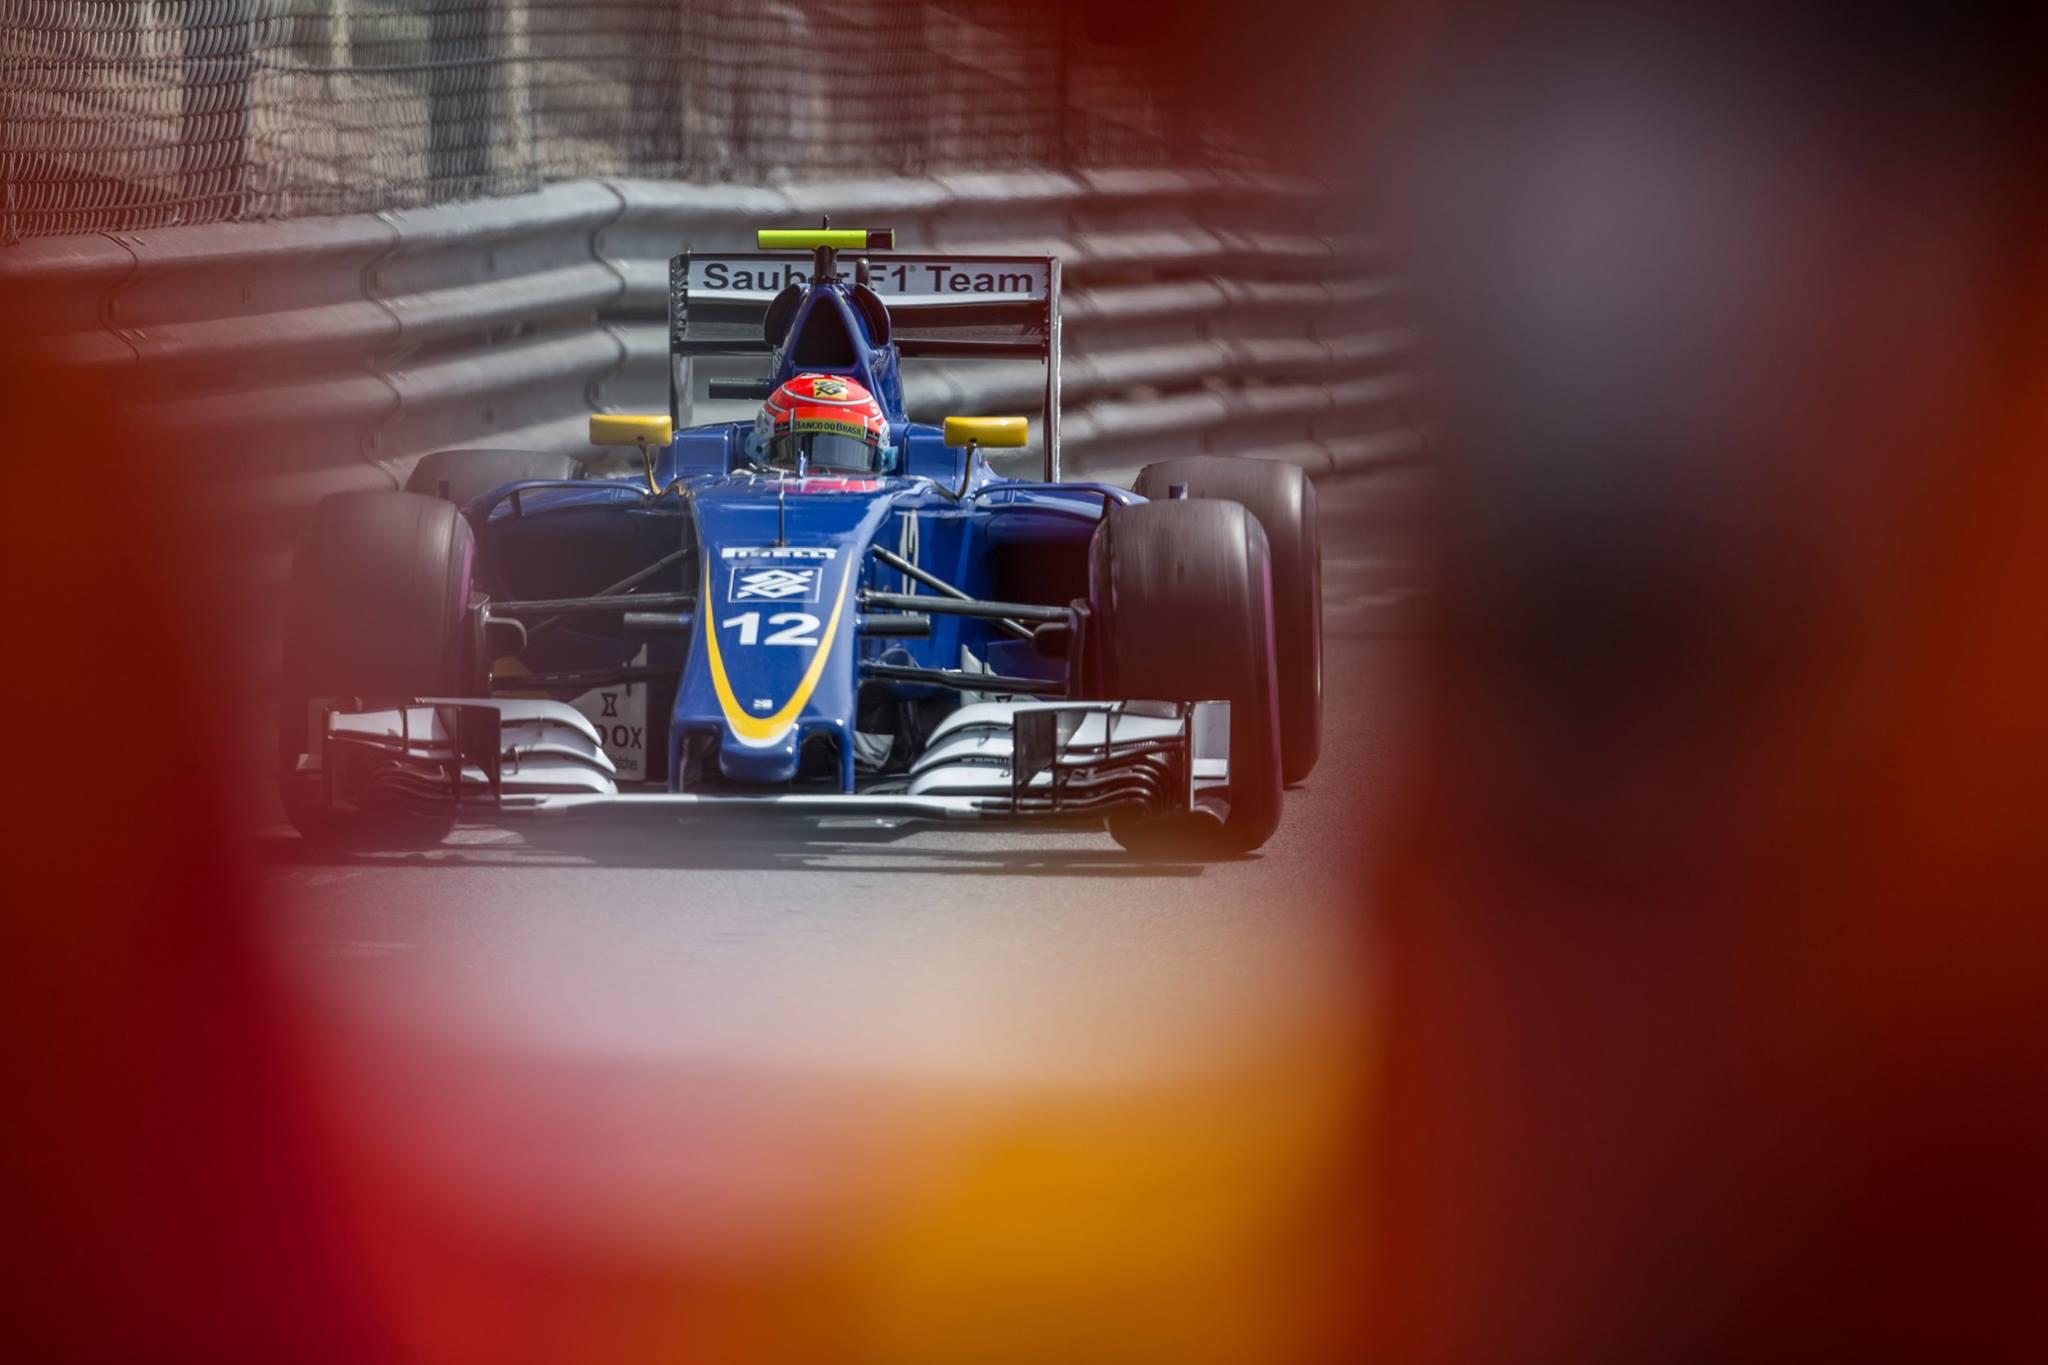 Monaco_domingo_2016_racef1 (1)